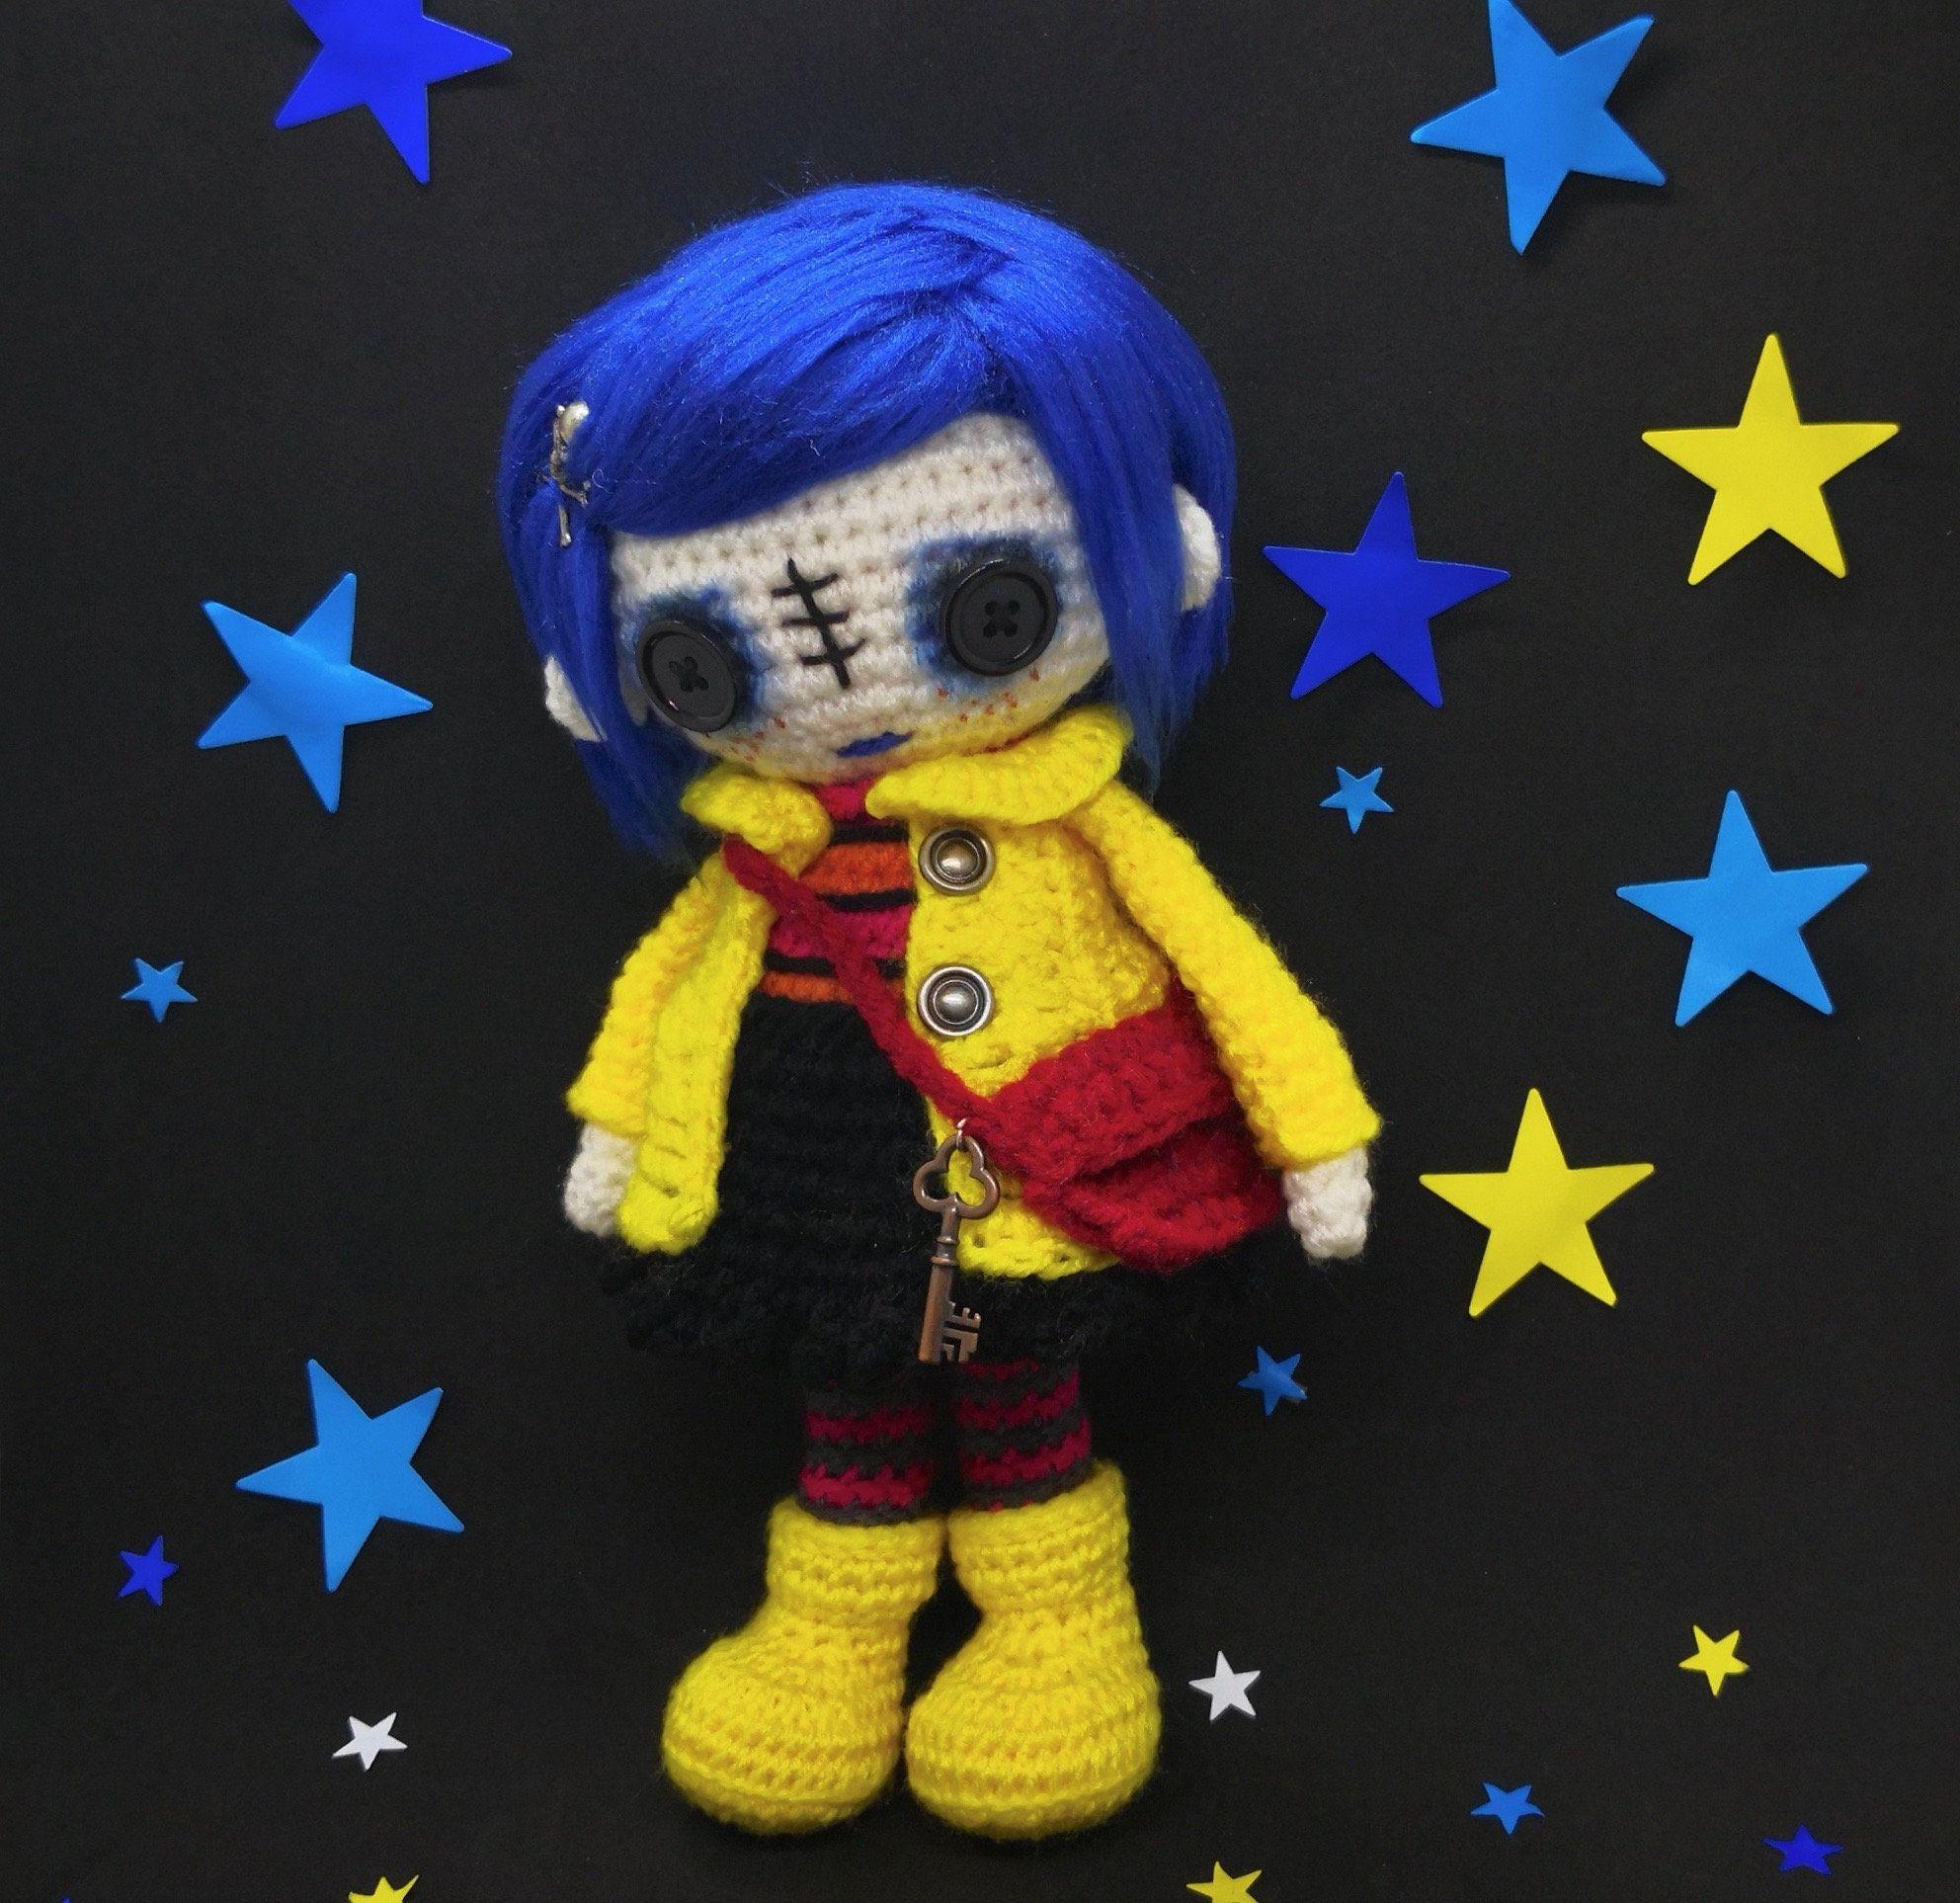 Crochet Pattern Coraline Coraline Doll Coraline Amigurumi Voodoo Doll Halloween Doll Witch Doll Whimsical C Crochet Doll Pattern Witch Doll Coraline Doll